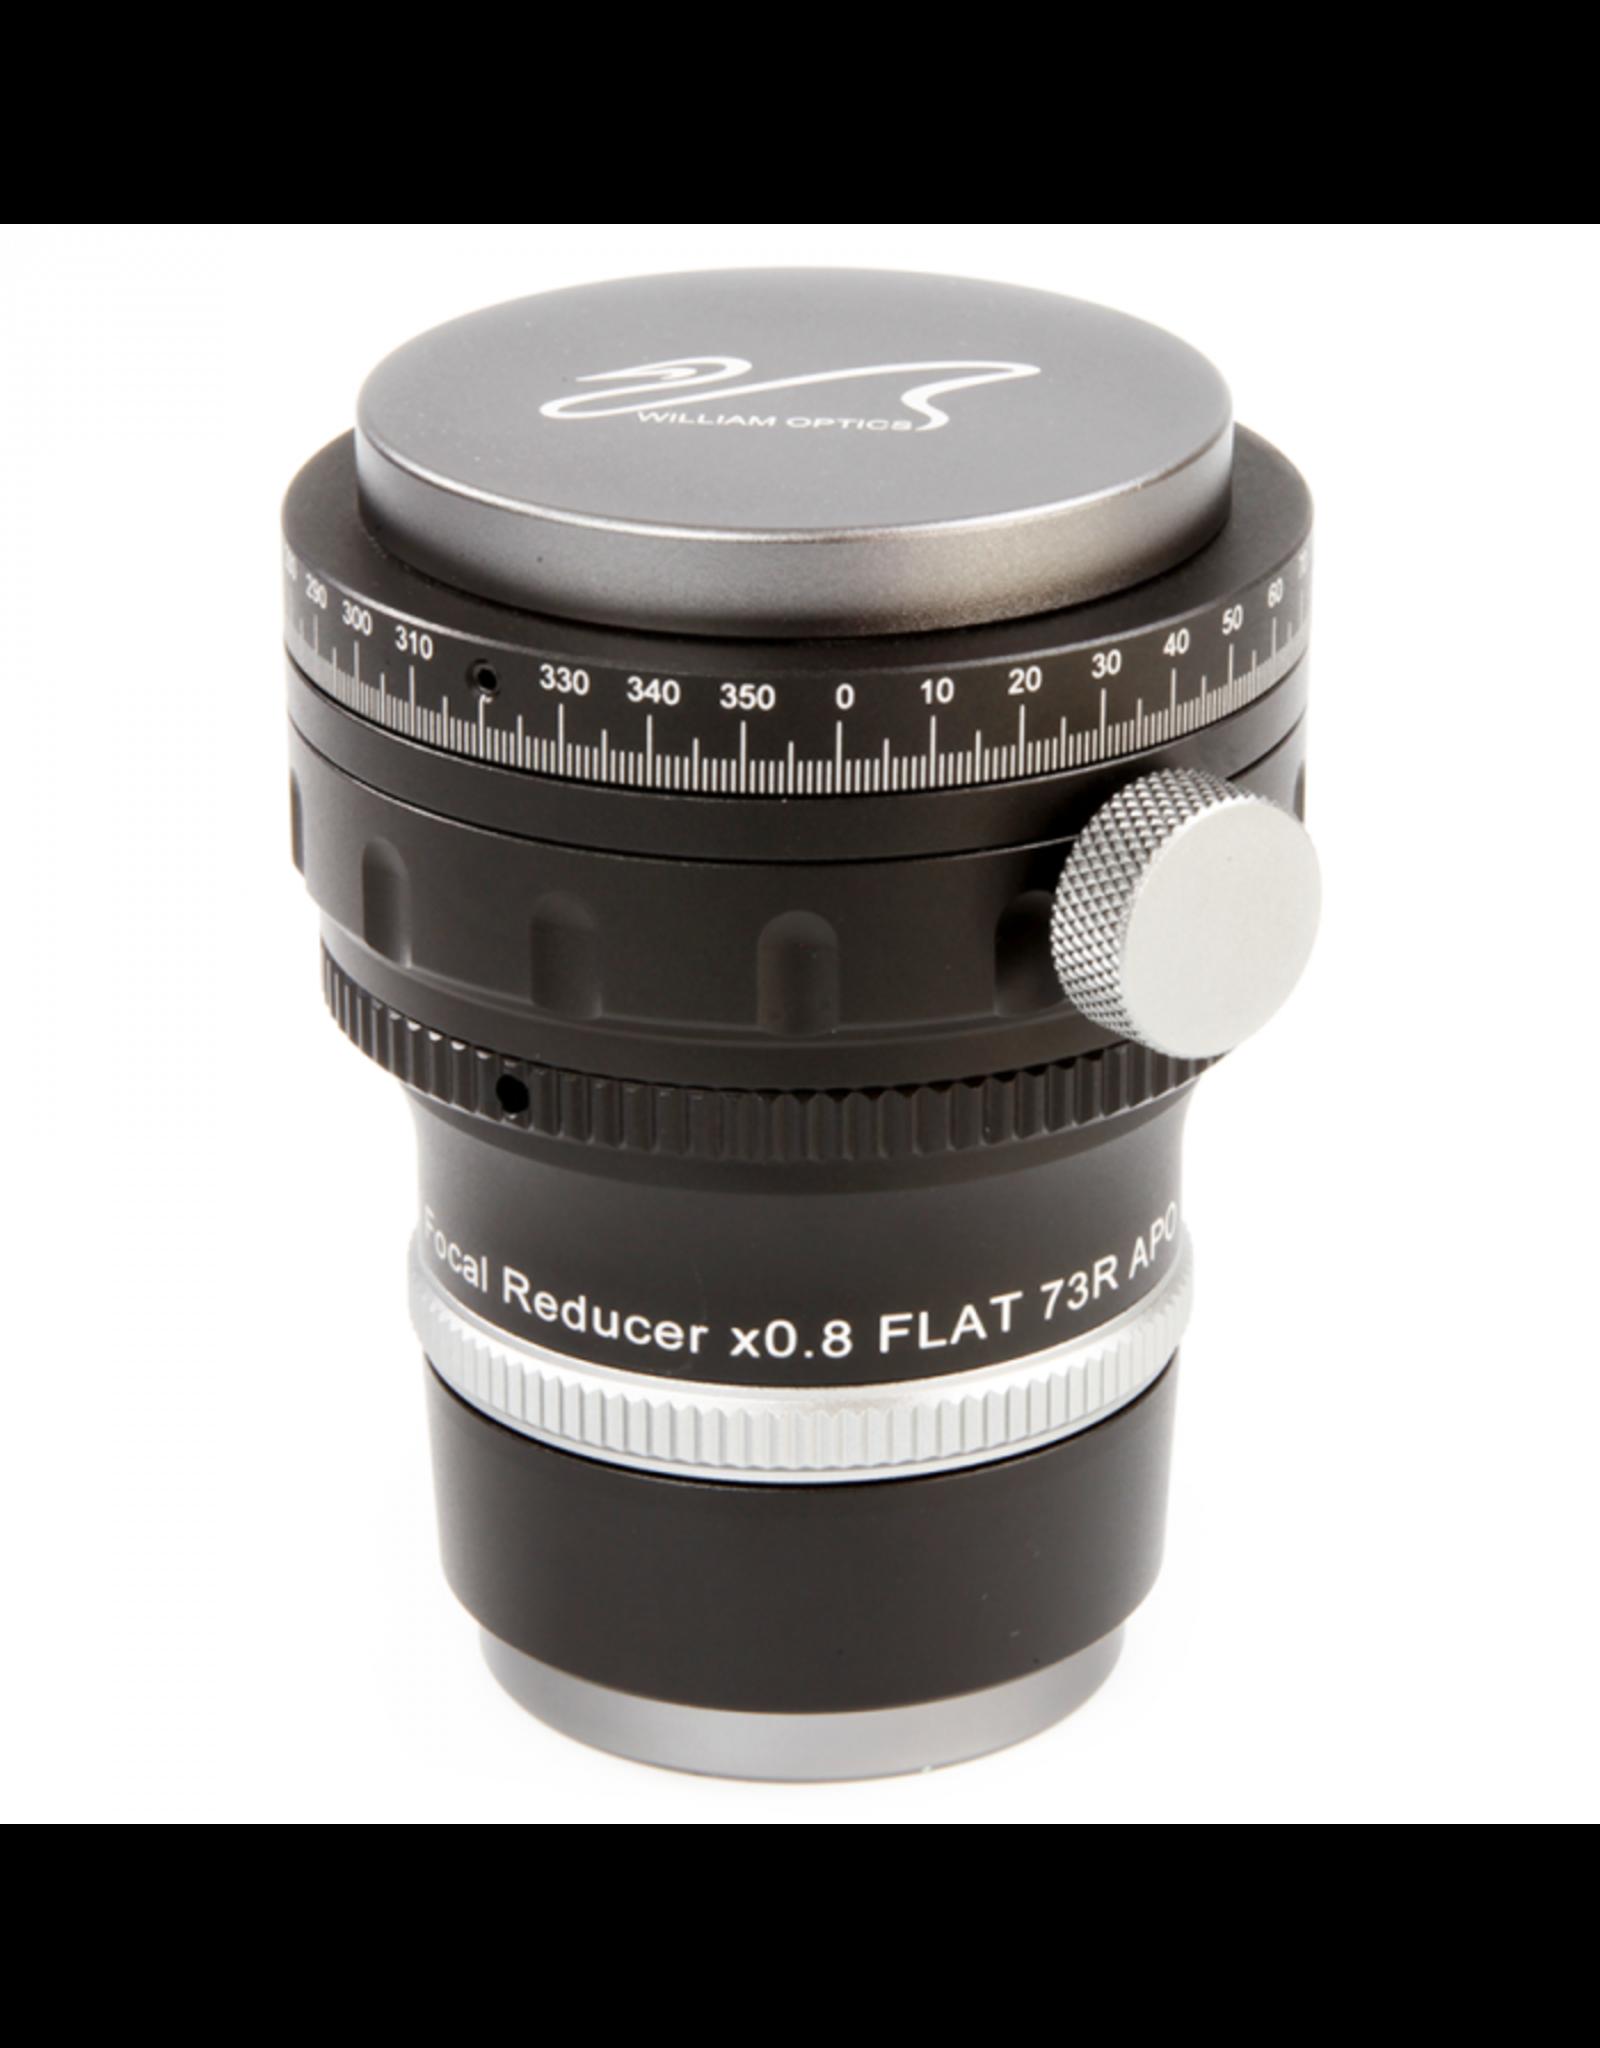 William Optcis Adjustable reducer flattener Flat73R for Z73